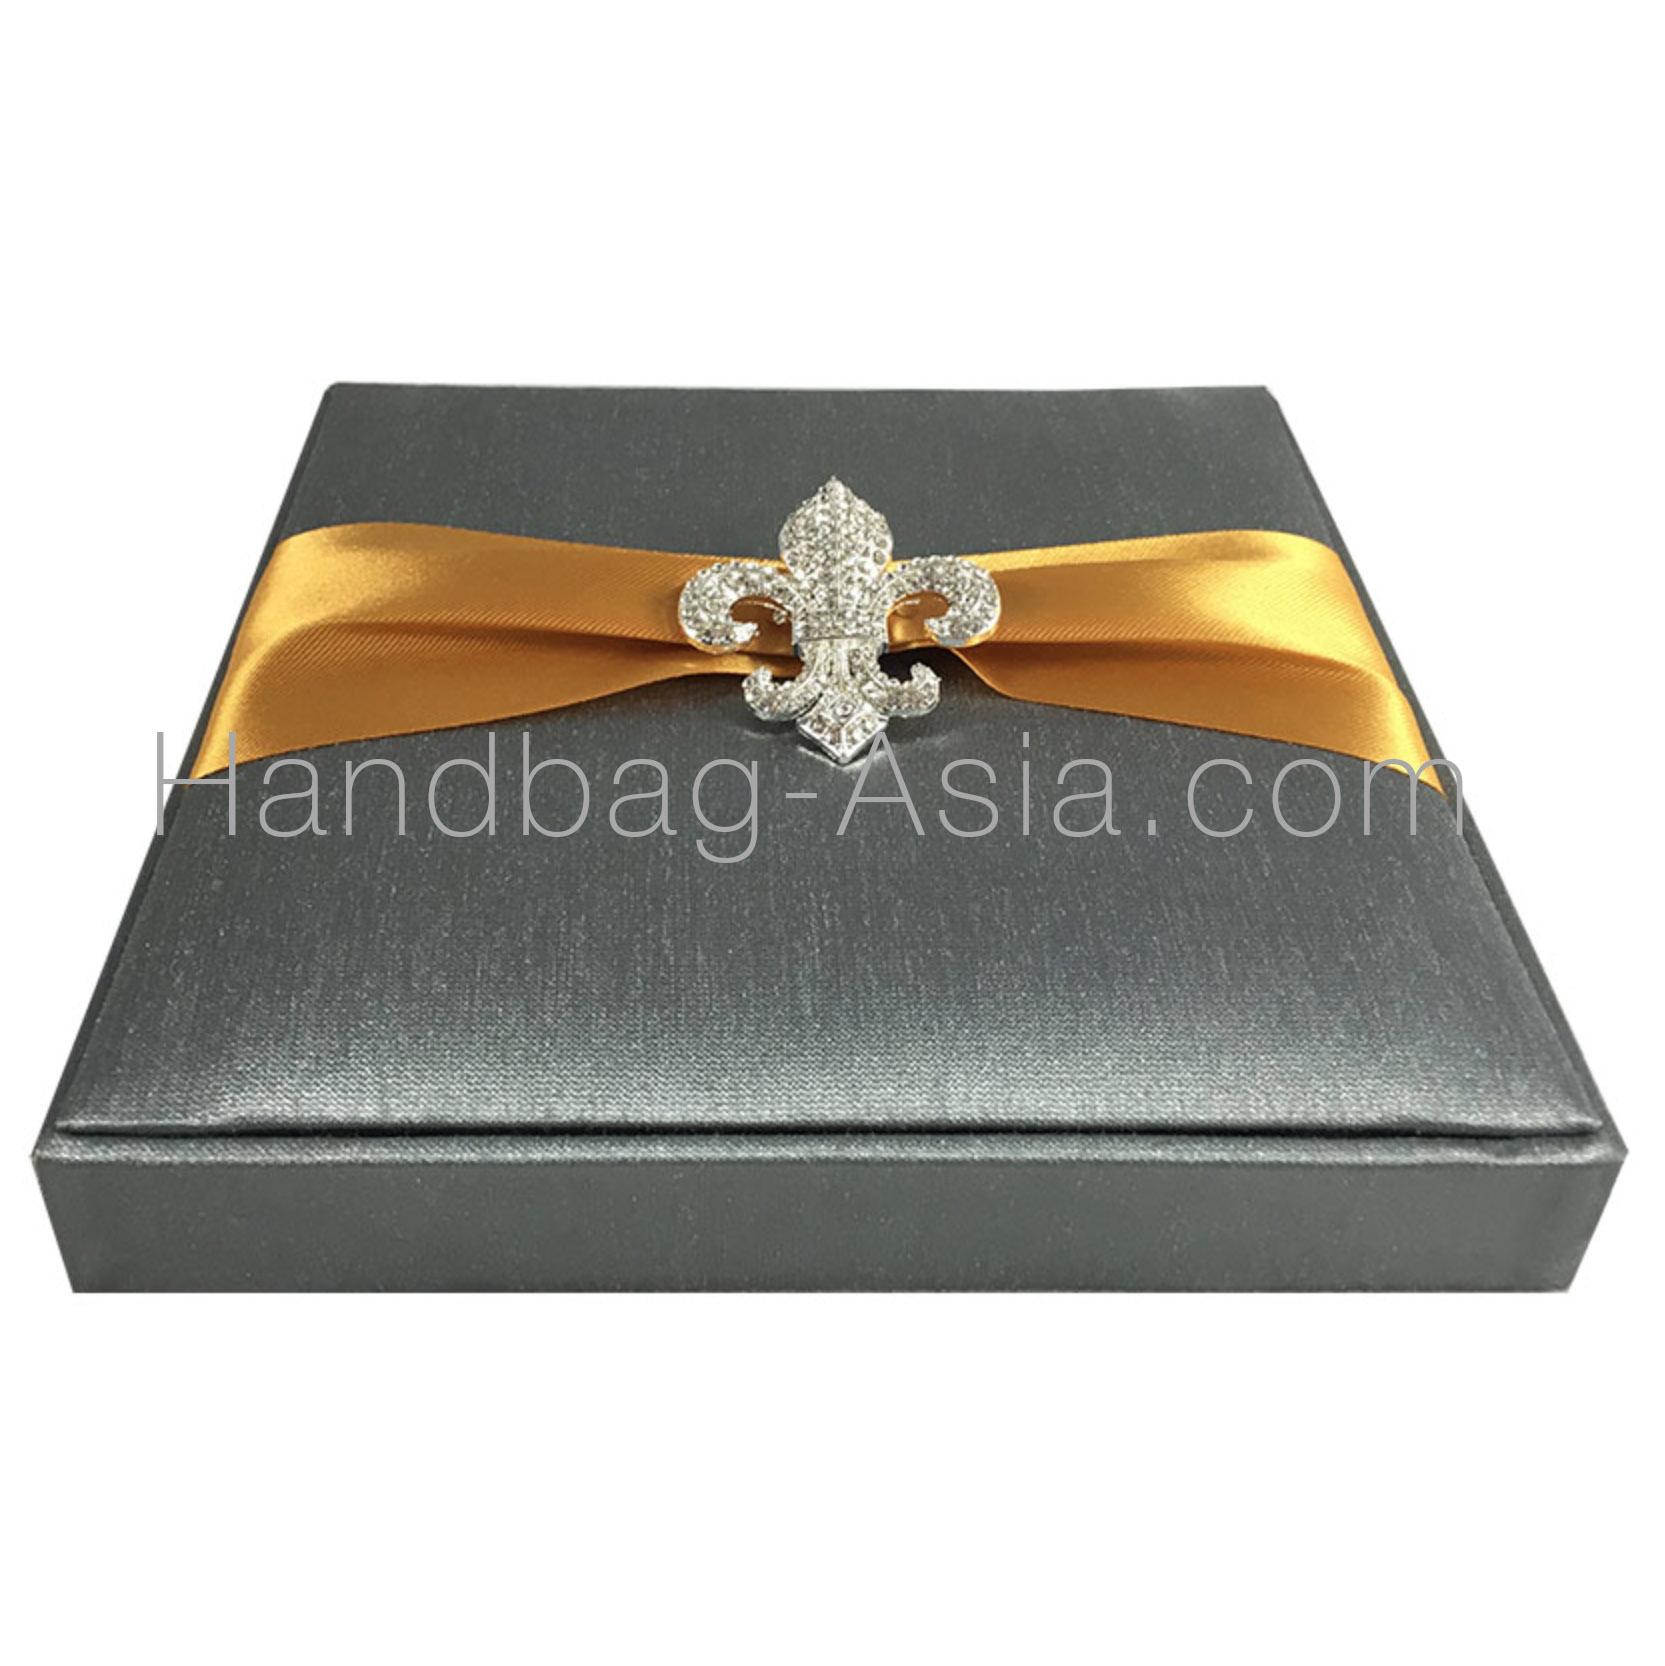 Fleur de lis wedding invitation charcoal dupioni silk large fleur de lis brooch embellished wedding box grey and gold monicamarmolfo Image collections